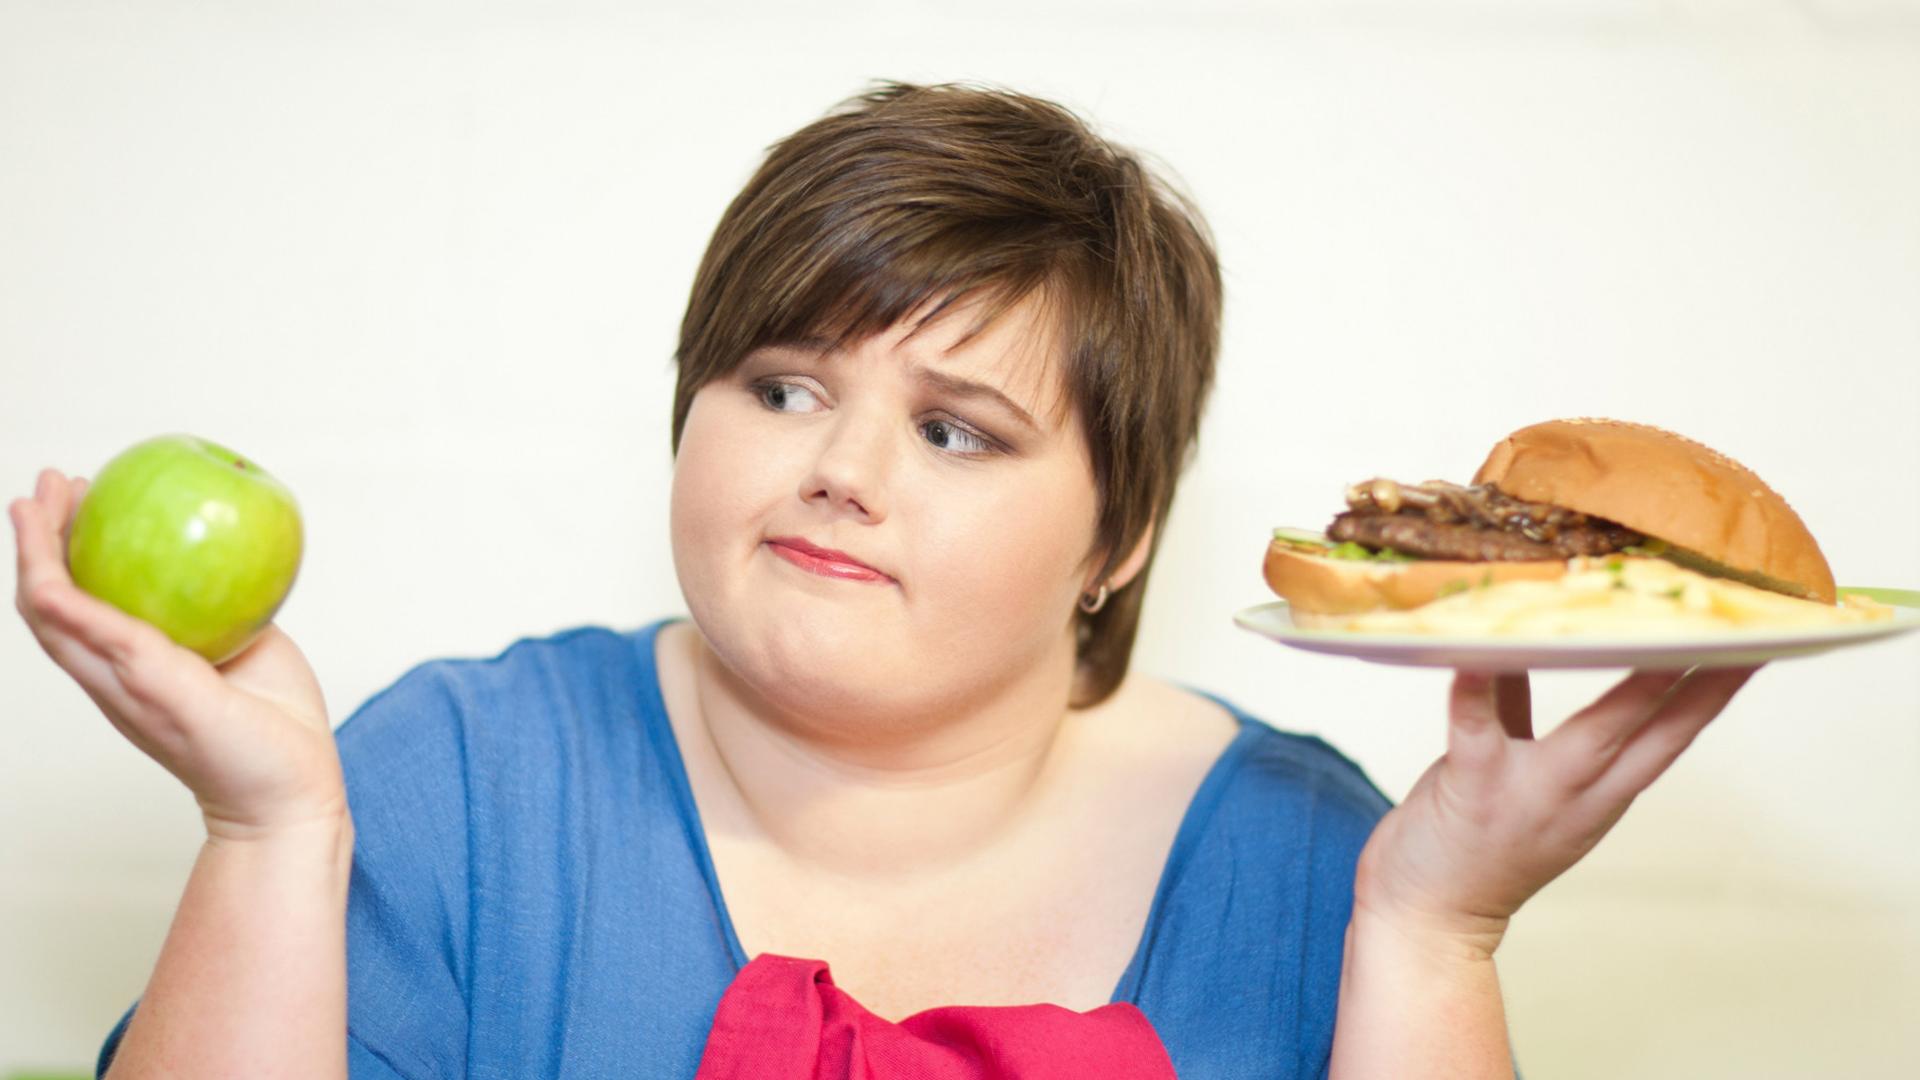 Obezitate. Endocrinologie. Afecțiuni | Laborator ImunoMedica